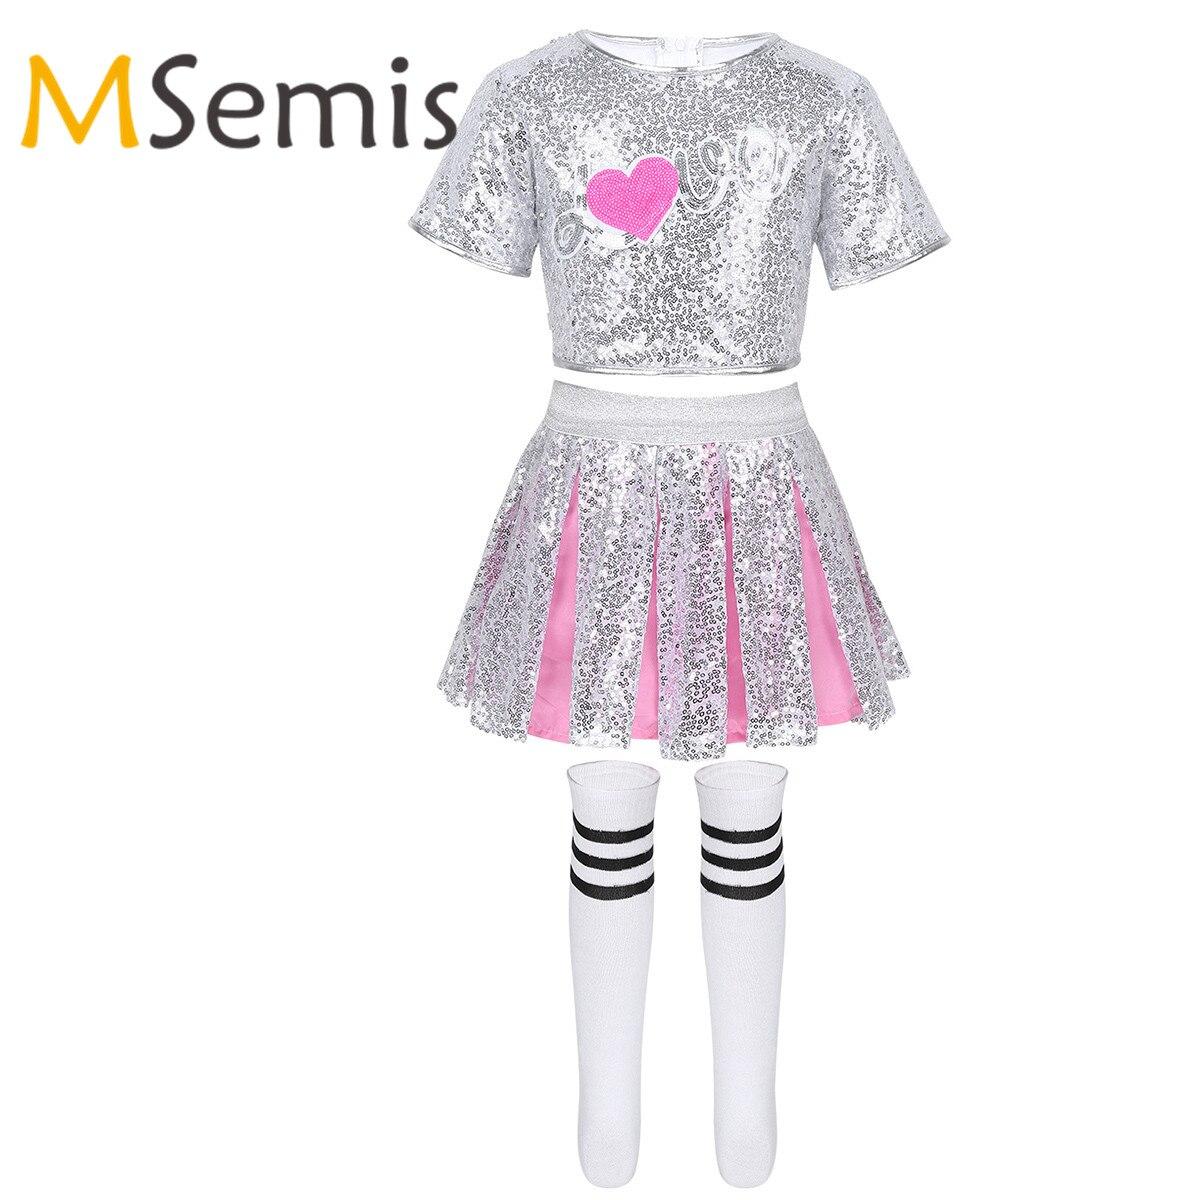 Kids Girls Cheerleader Costumes Outfit Sparkling Sequins Crop Top With Skirt Striped Socks Jazz Hip Hop Modern Dancewear Set